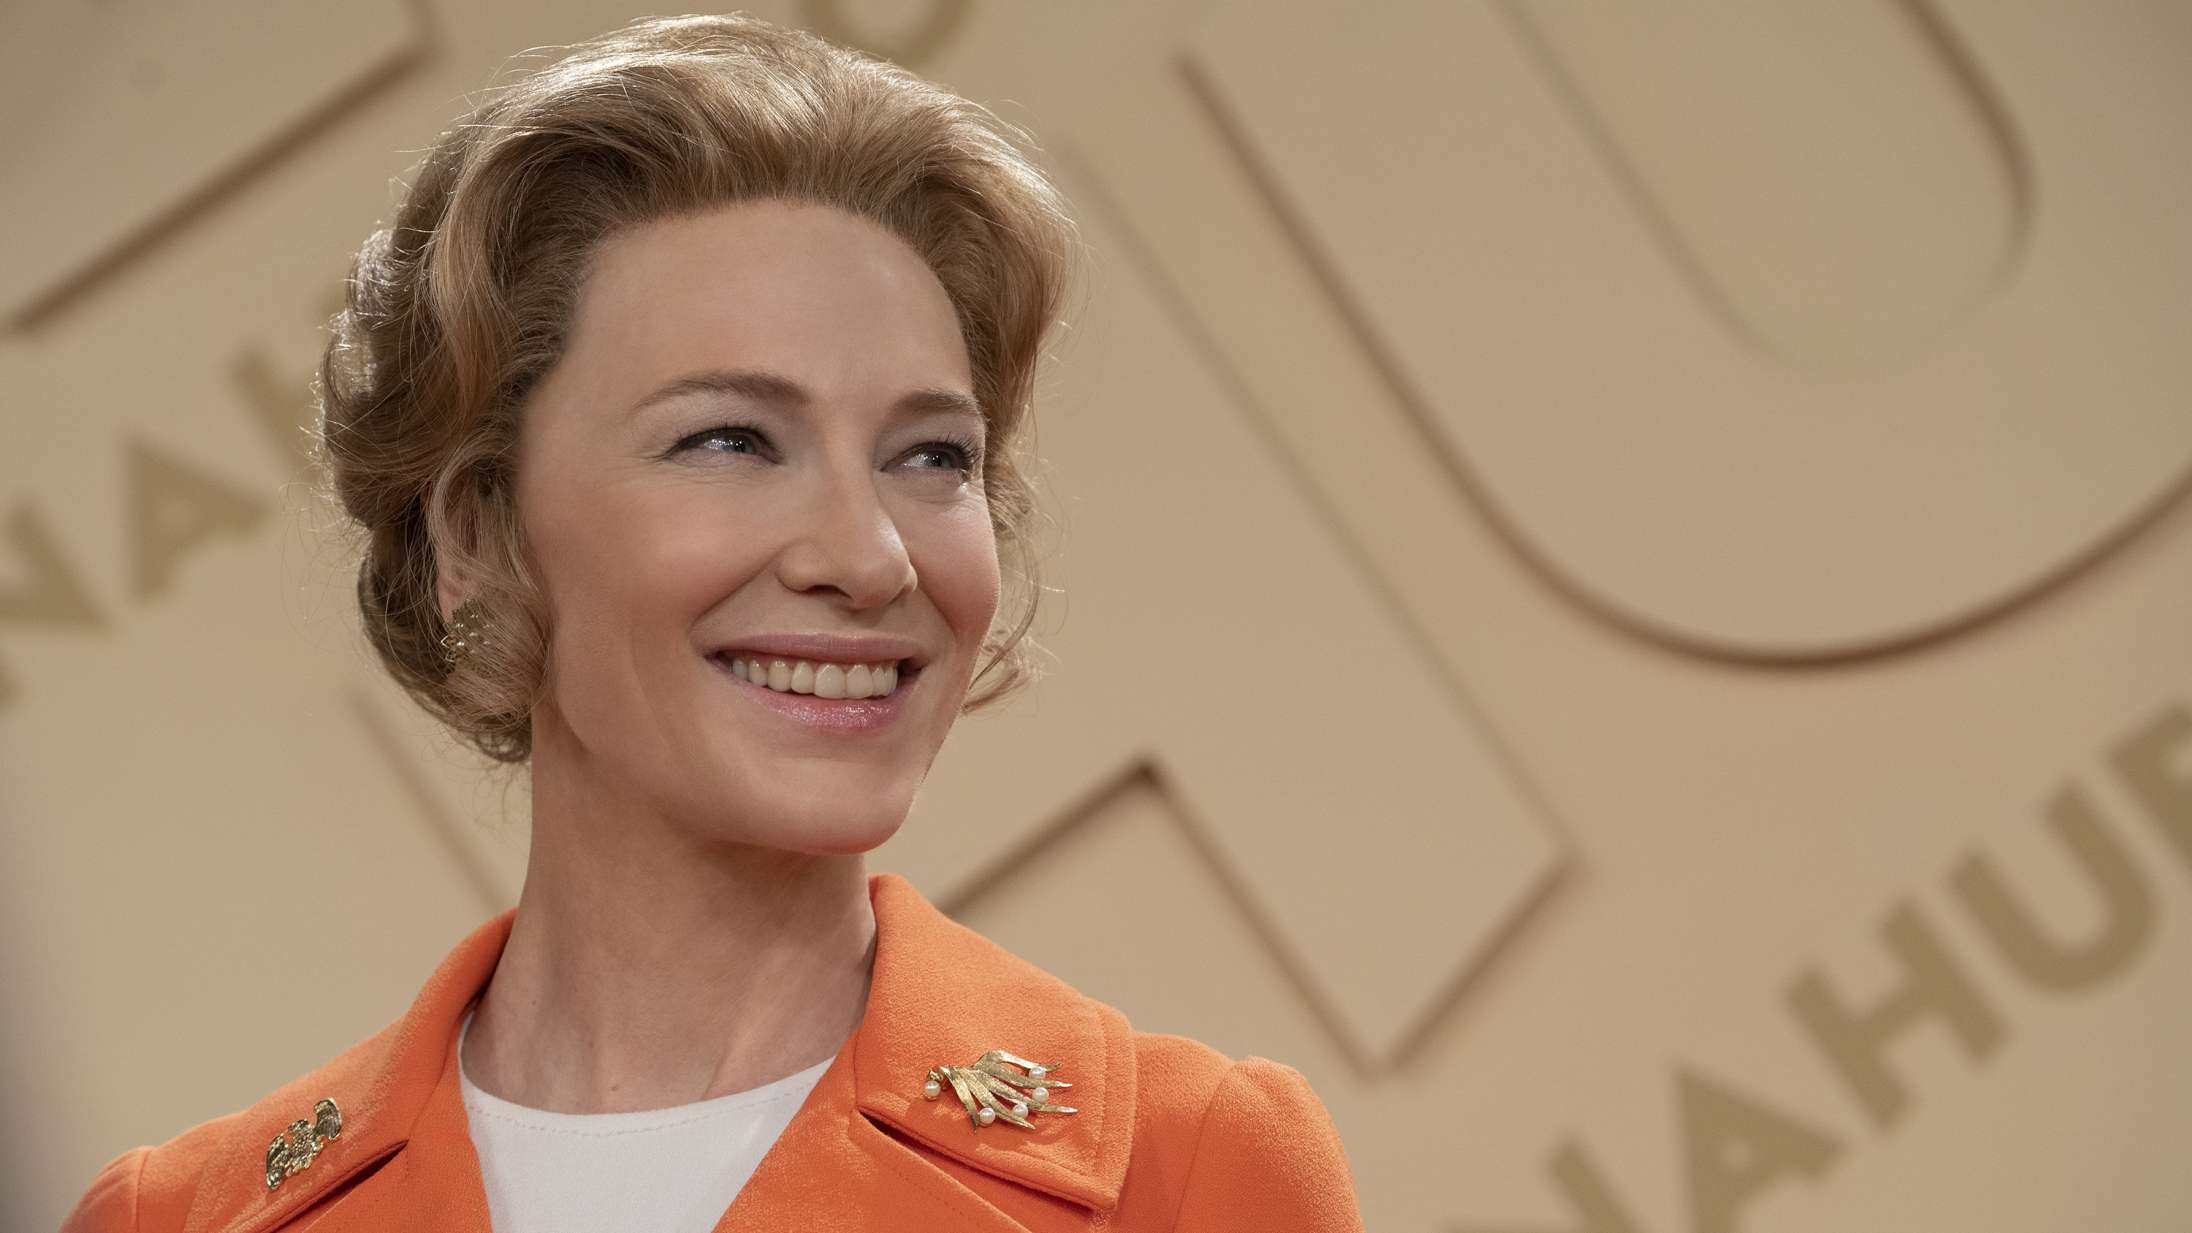 'Mrs. America': Feministkampen raser aktuelt i ny serie med vanvittig stjerneparade